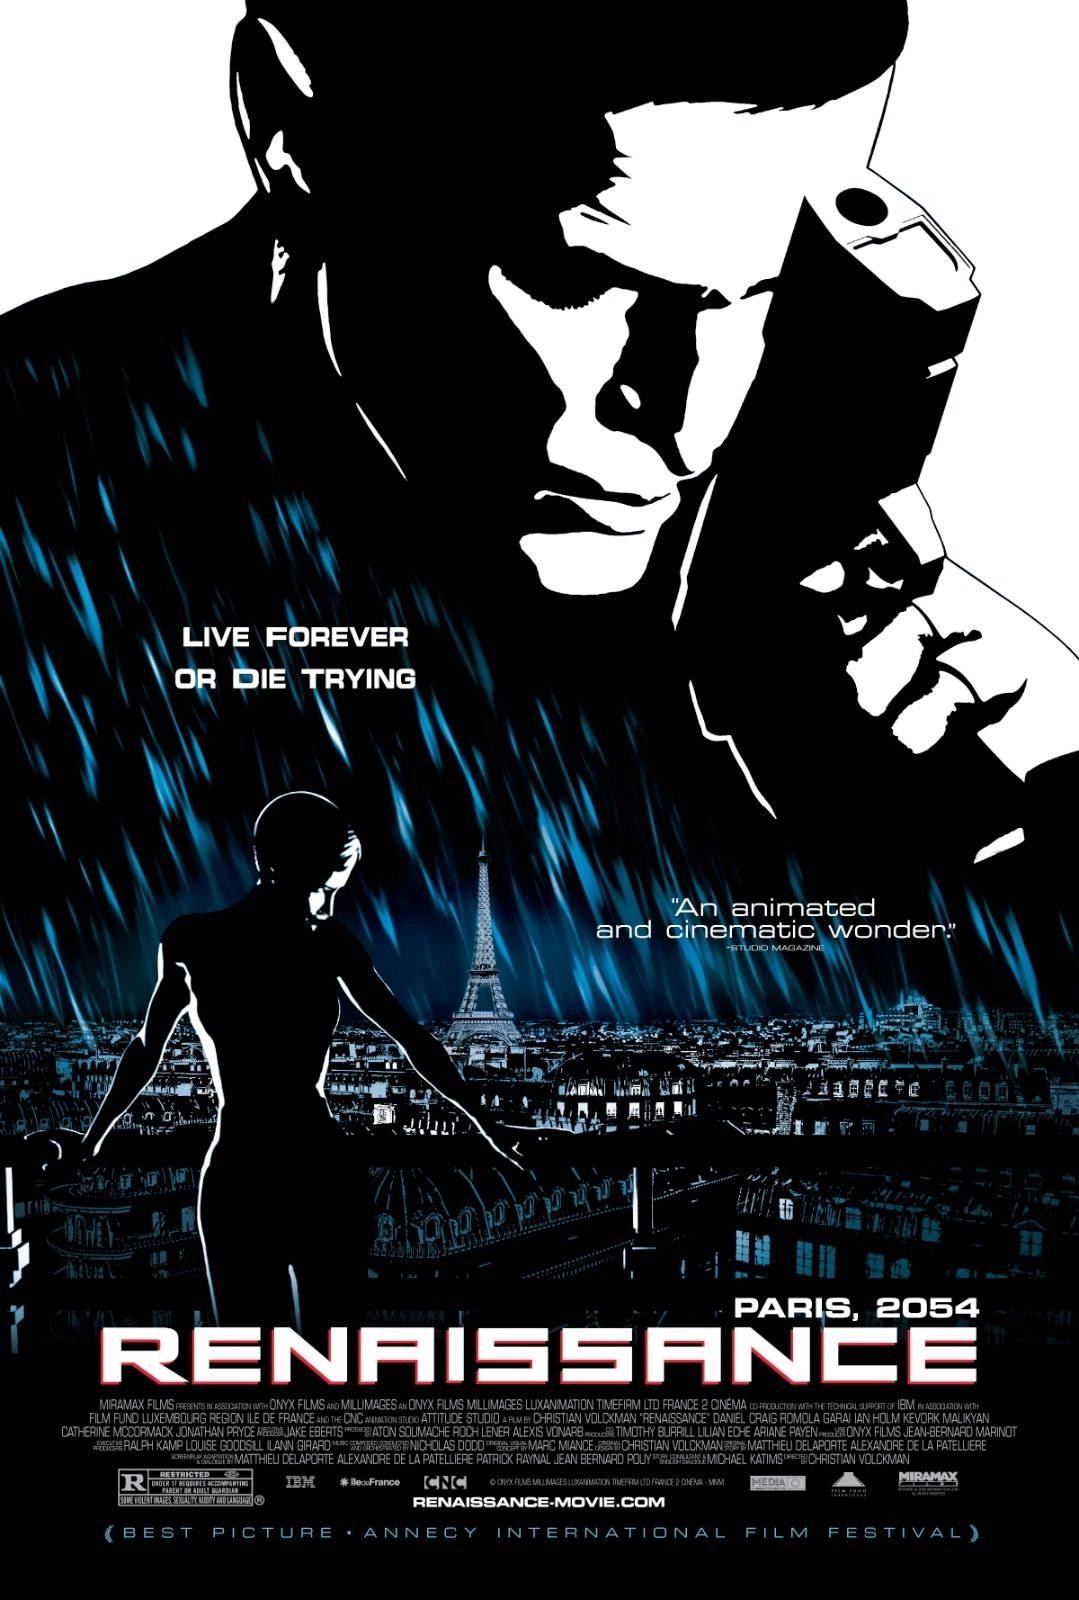 74001-Renaissance-2006-Animation-Action-Sci-Fi-Wall-Print-Poster-Affiche